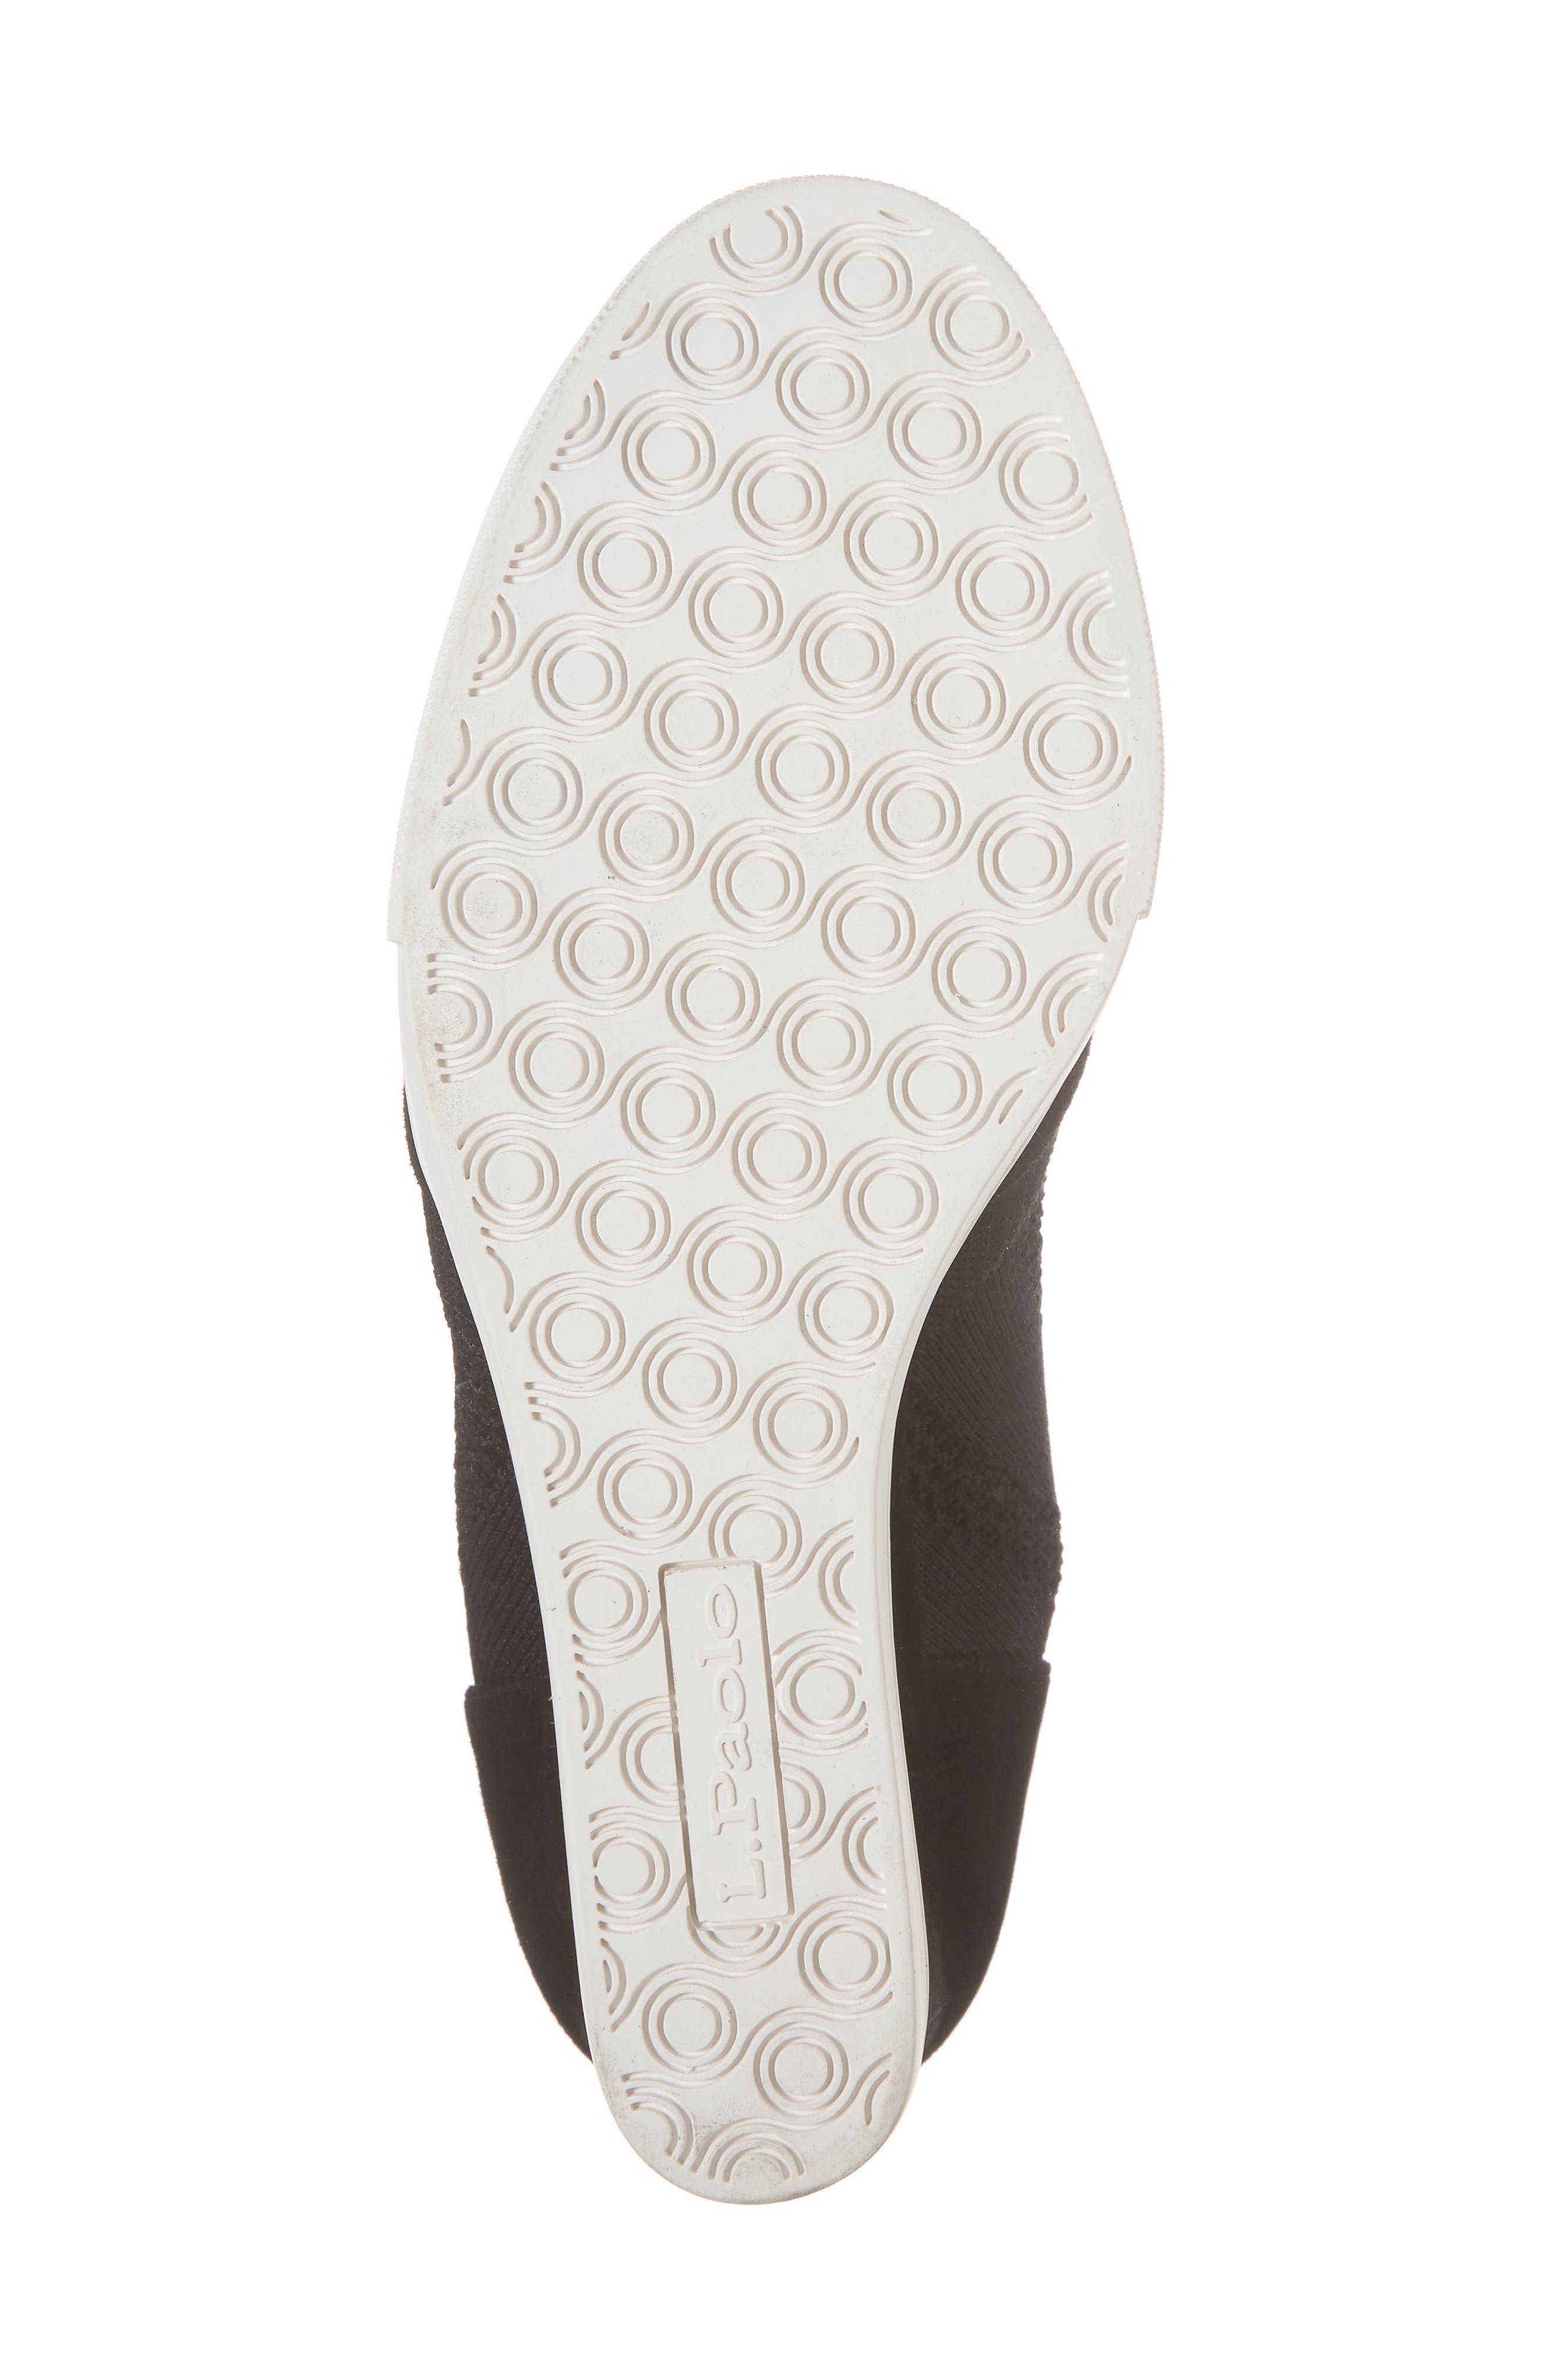 Fabiana Wedge Sneaker,                             Alternate thumbnail 6, color,                             BLACK SUEDE